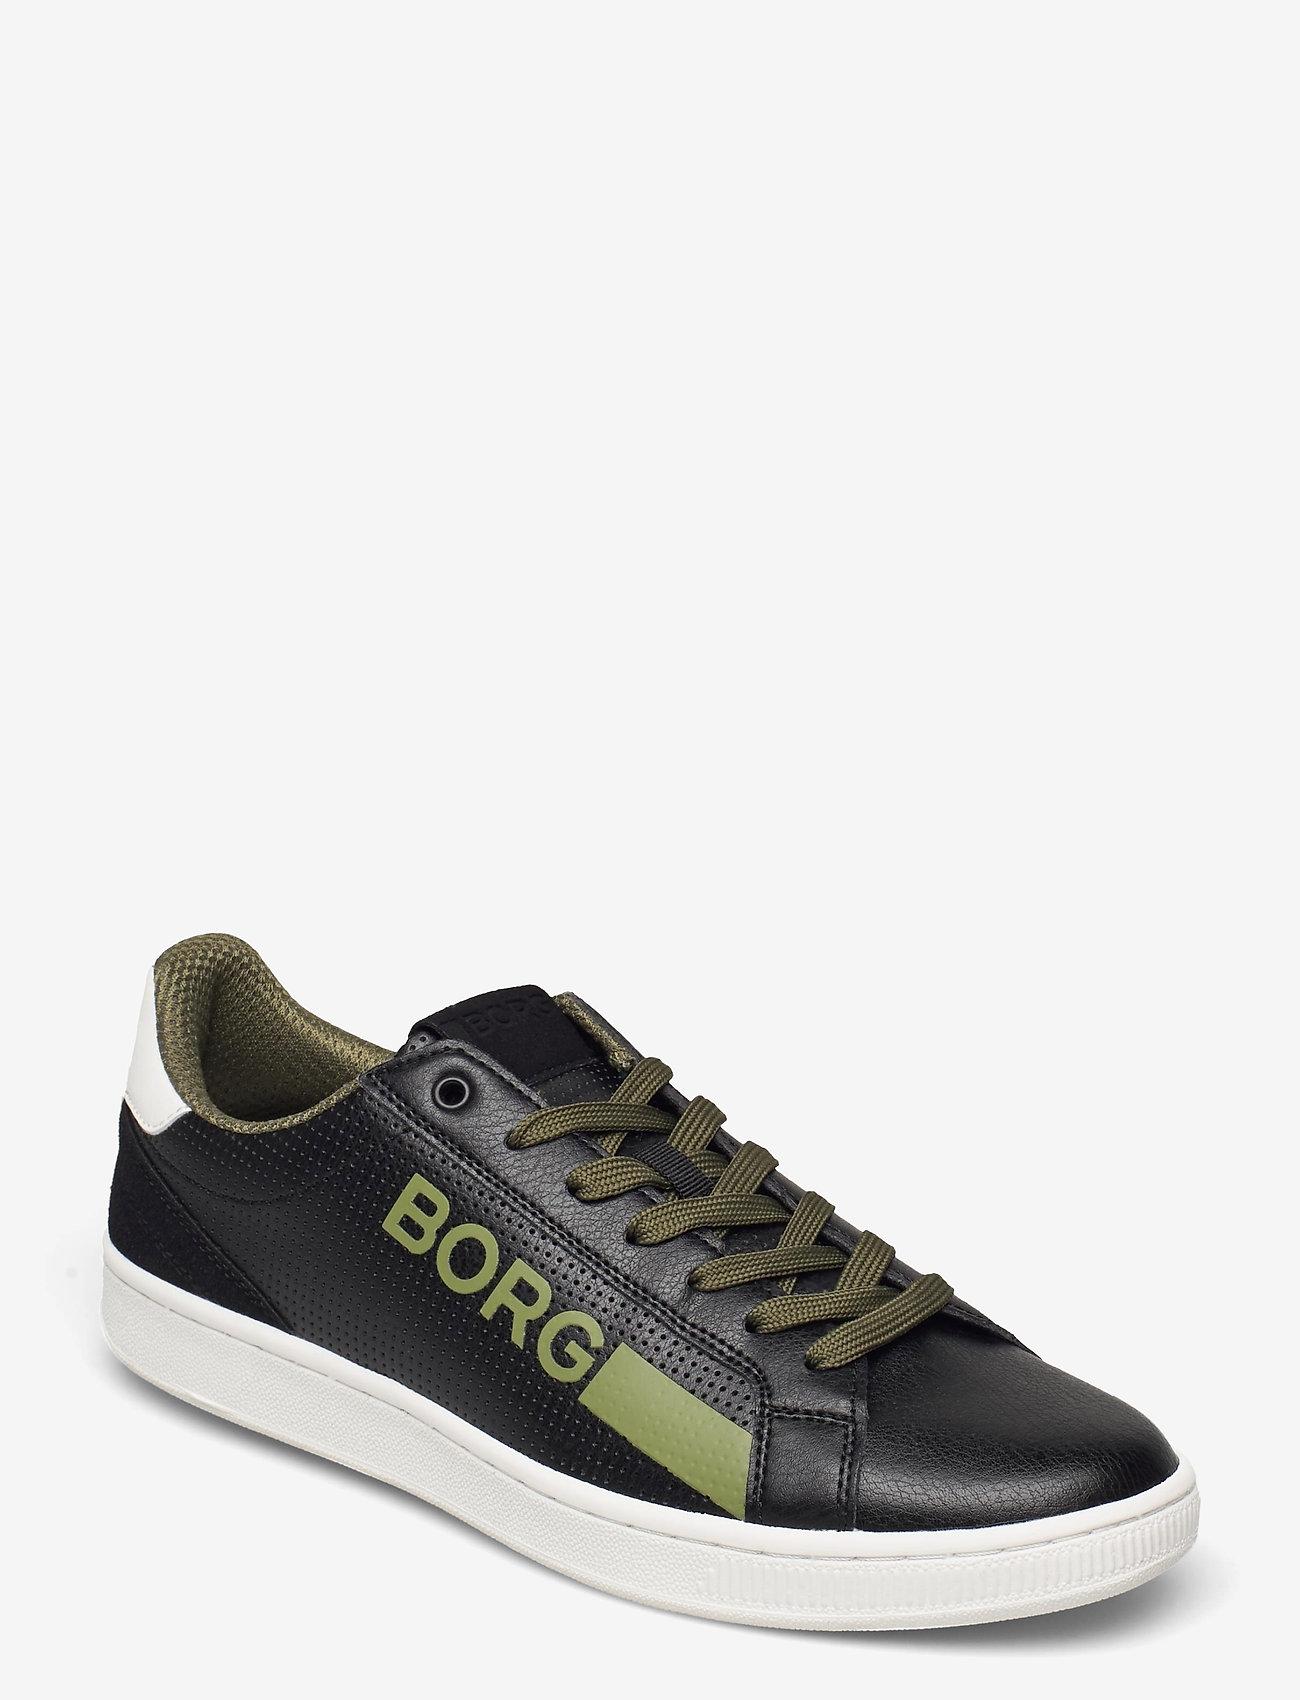 Björn Borg - T330 Low Ctr Prf M - laag sneakers - black-white - 0